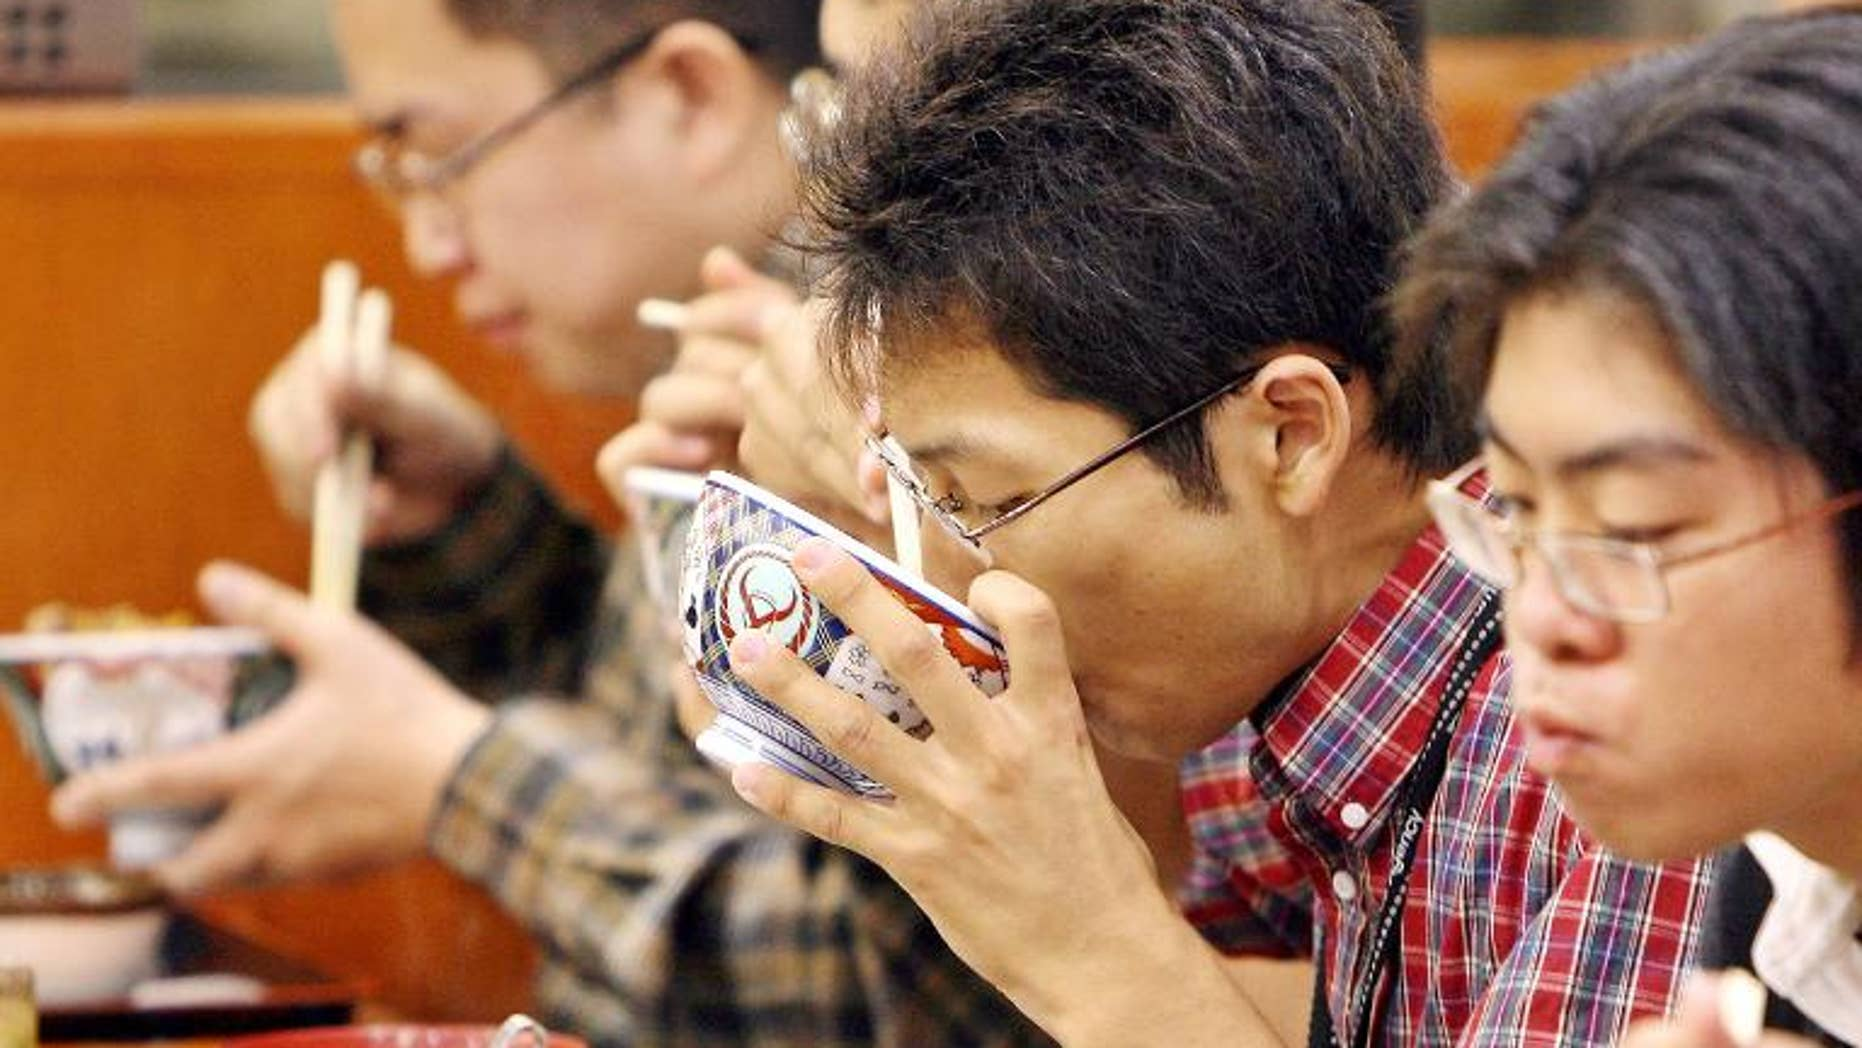 Illustration: customers dine at a Yoshinoya fast food restaurant in Tokyo. The company says it will start farming produce in Fukushima